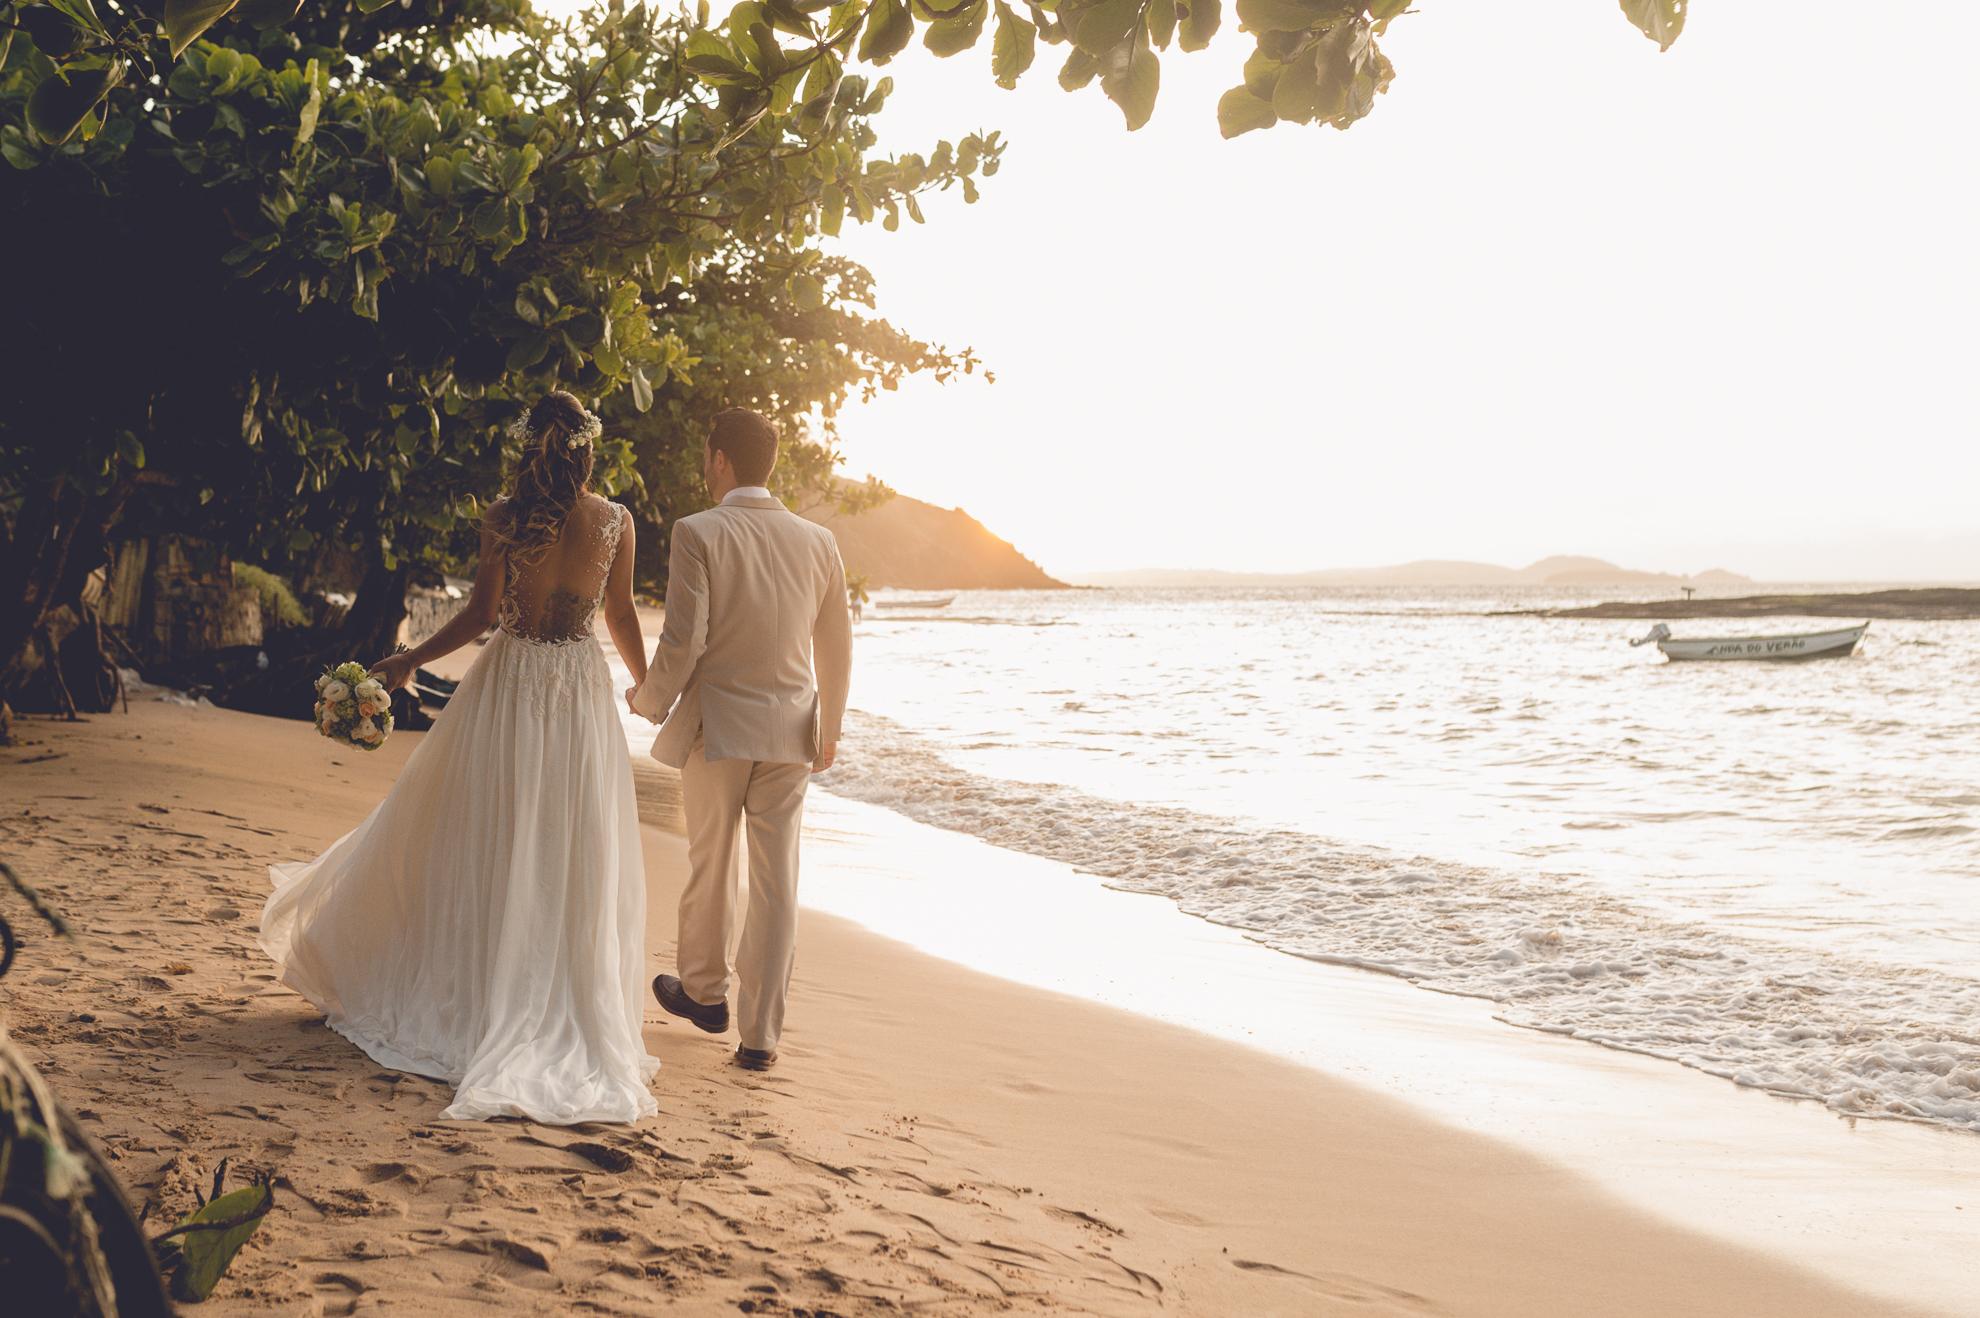 Pousada Praia da Tartaruga - Priscila & Guilherme (80)